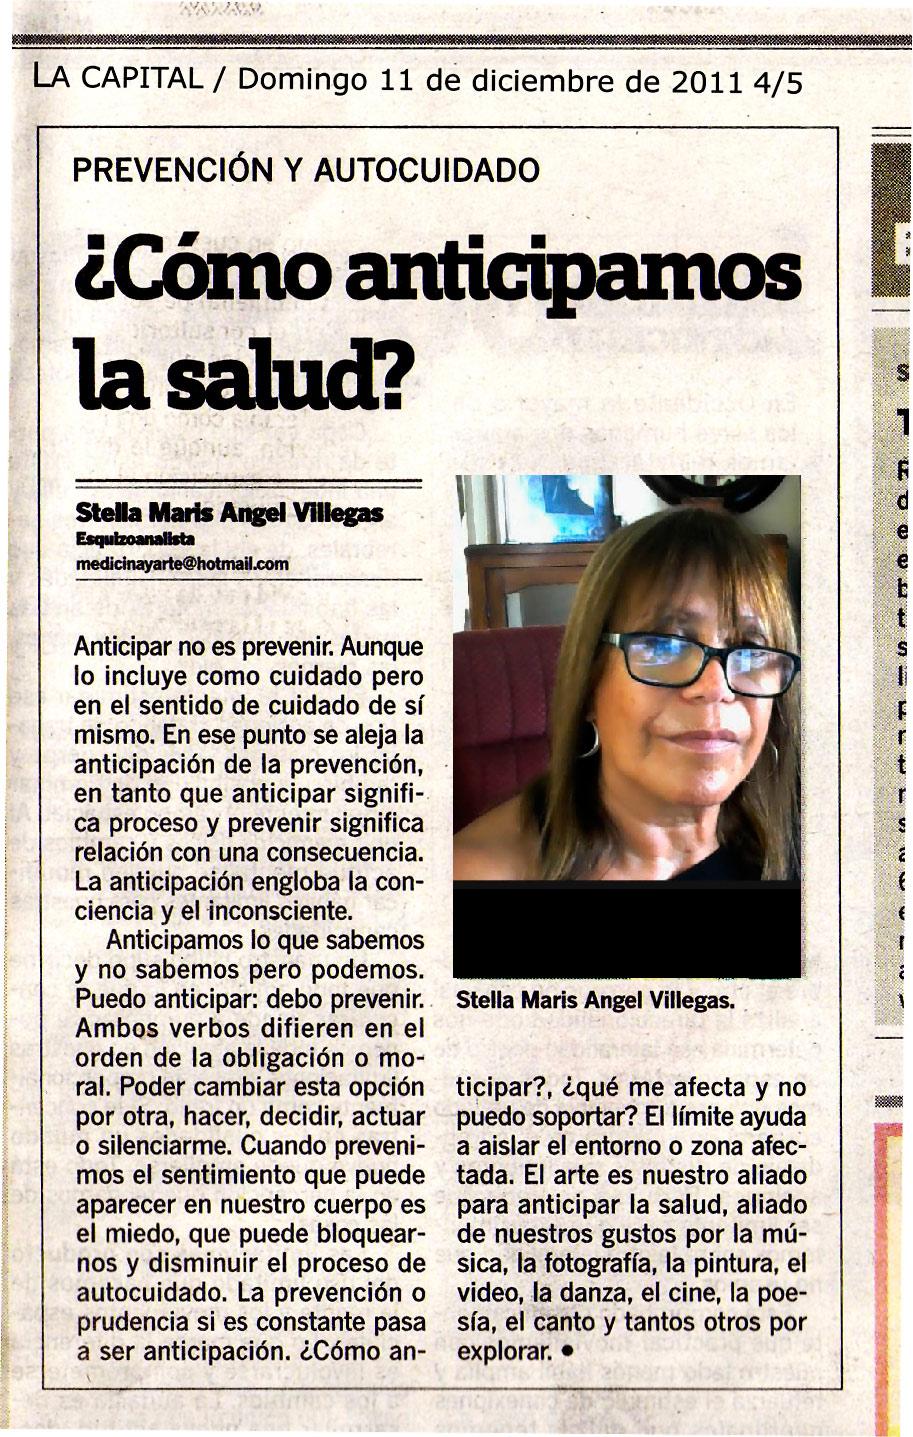 http://medicinayarte.com/img/anticpar_la_salud_la_capital_max.jpg